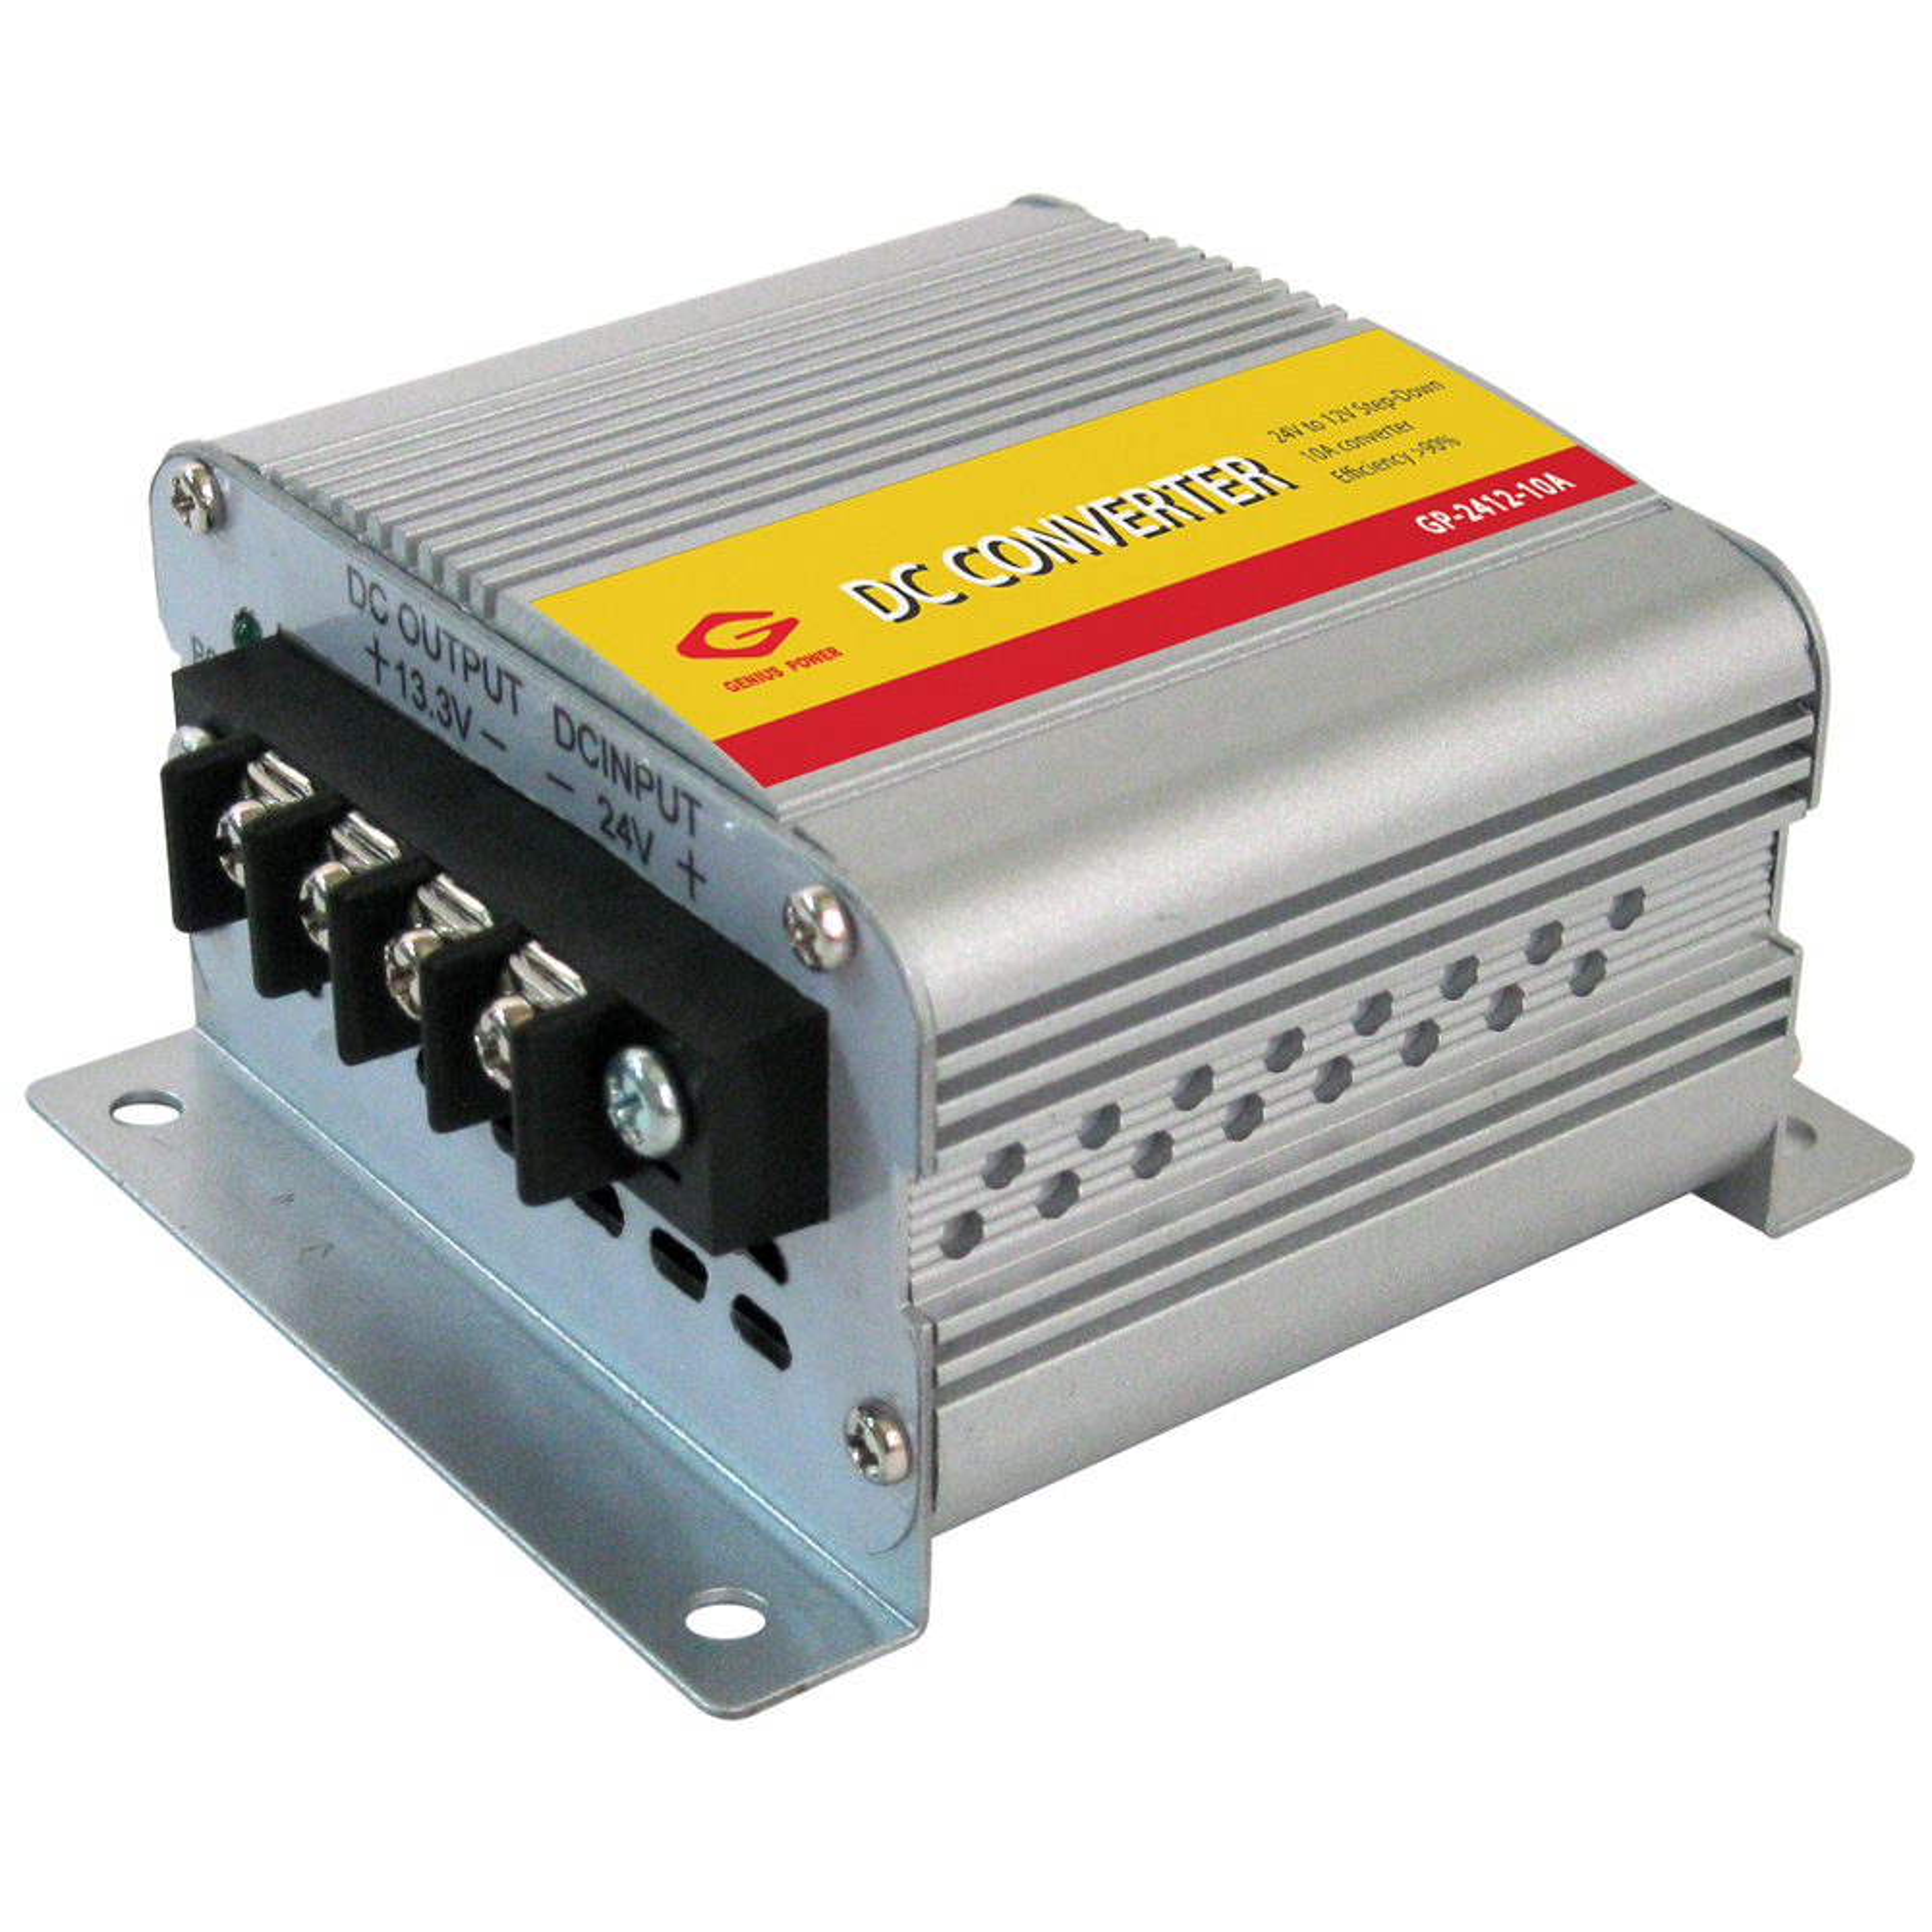 KIMISS DC 24V a 12V Convertidor de poder Inversor el/éctrico Reductor de voltaje Transformador descendente con m/ás Opciones para Carro /& Coche 40A // 480W